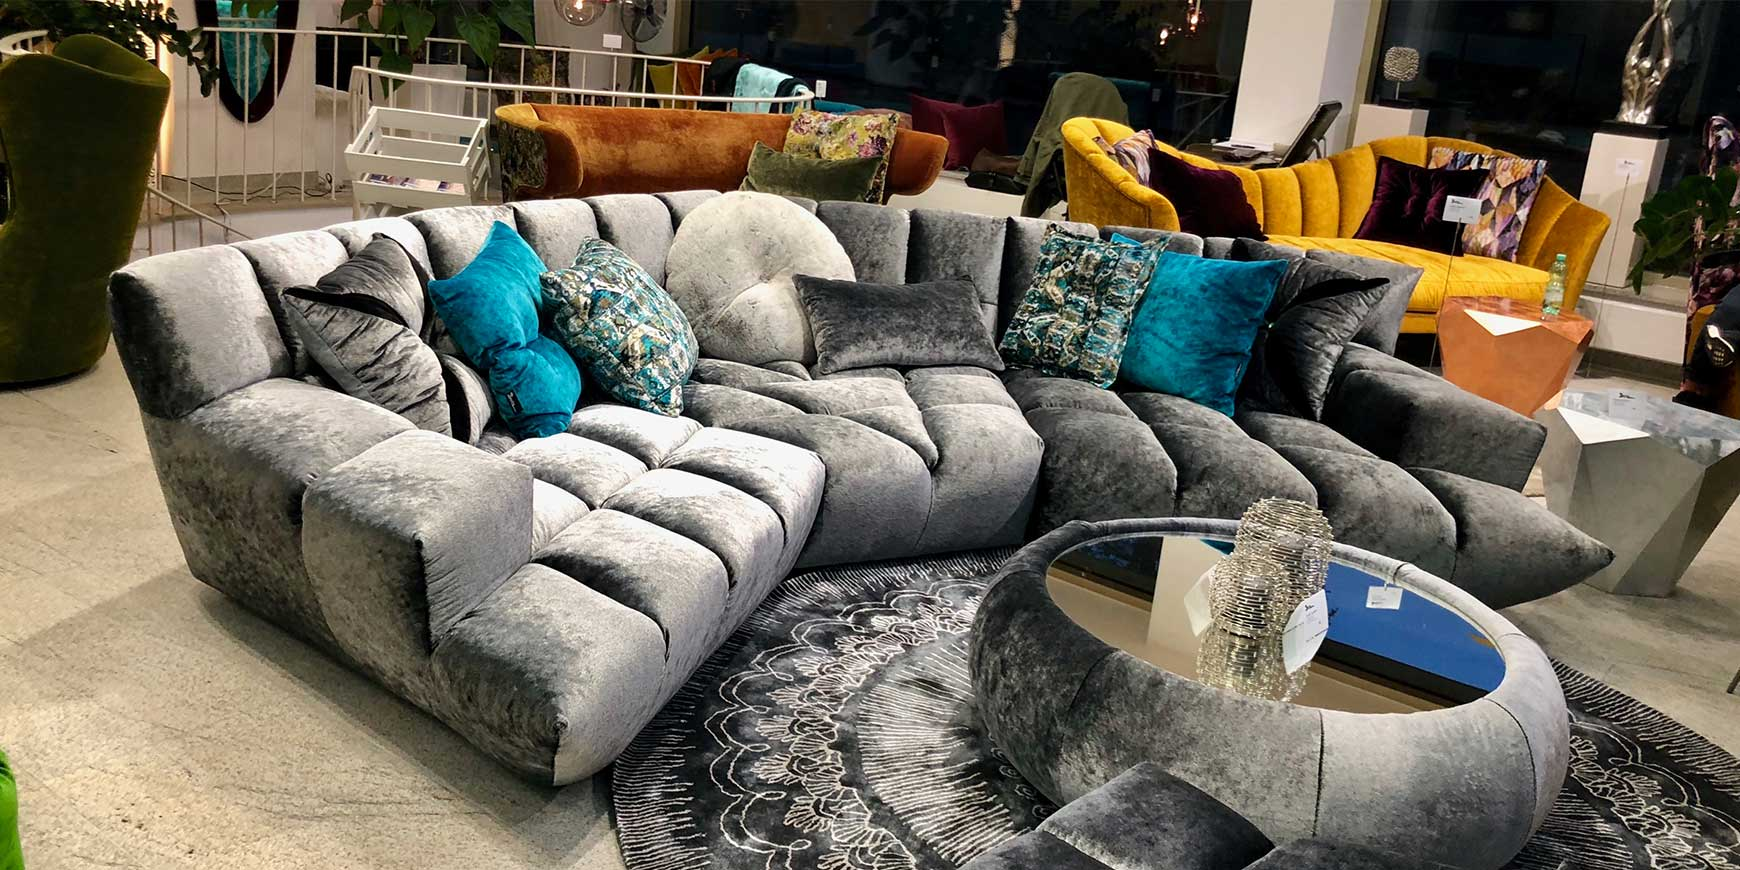 bretz cloud 7 sofa z 154 ausstellungsst cke r e d u z i e r t. Black Bedroom Furniture Sets. Home Design Ideas